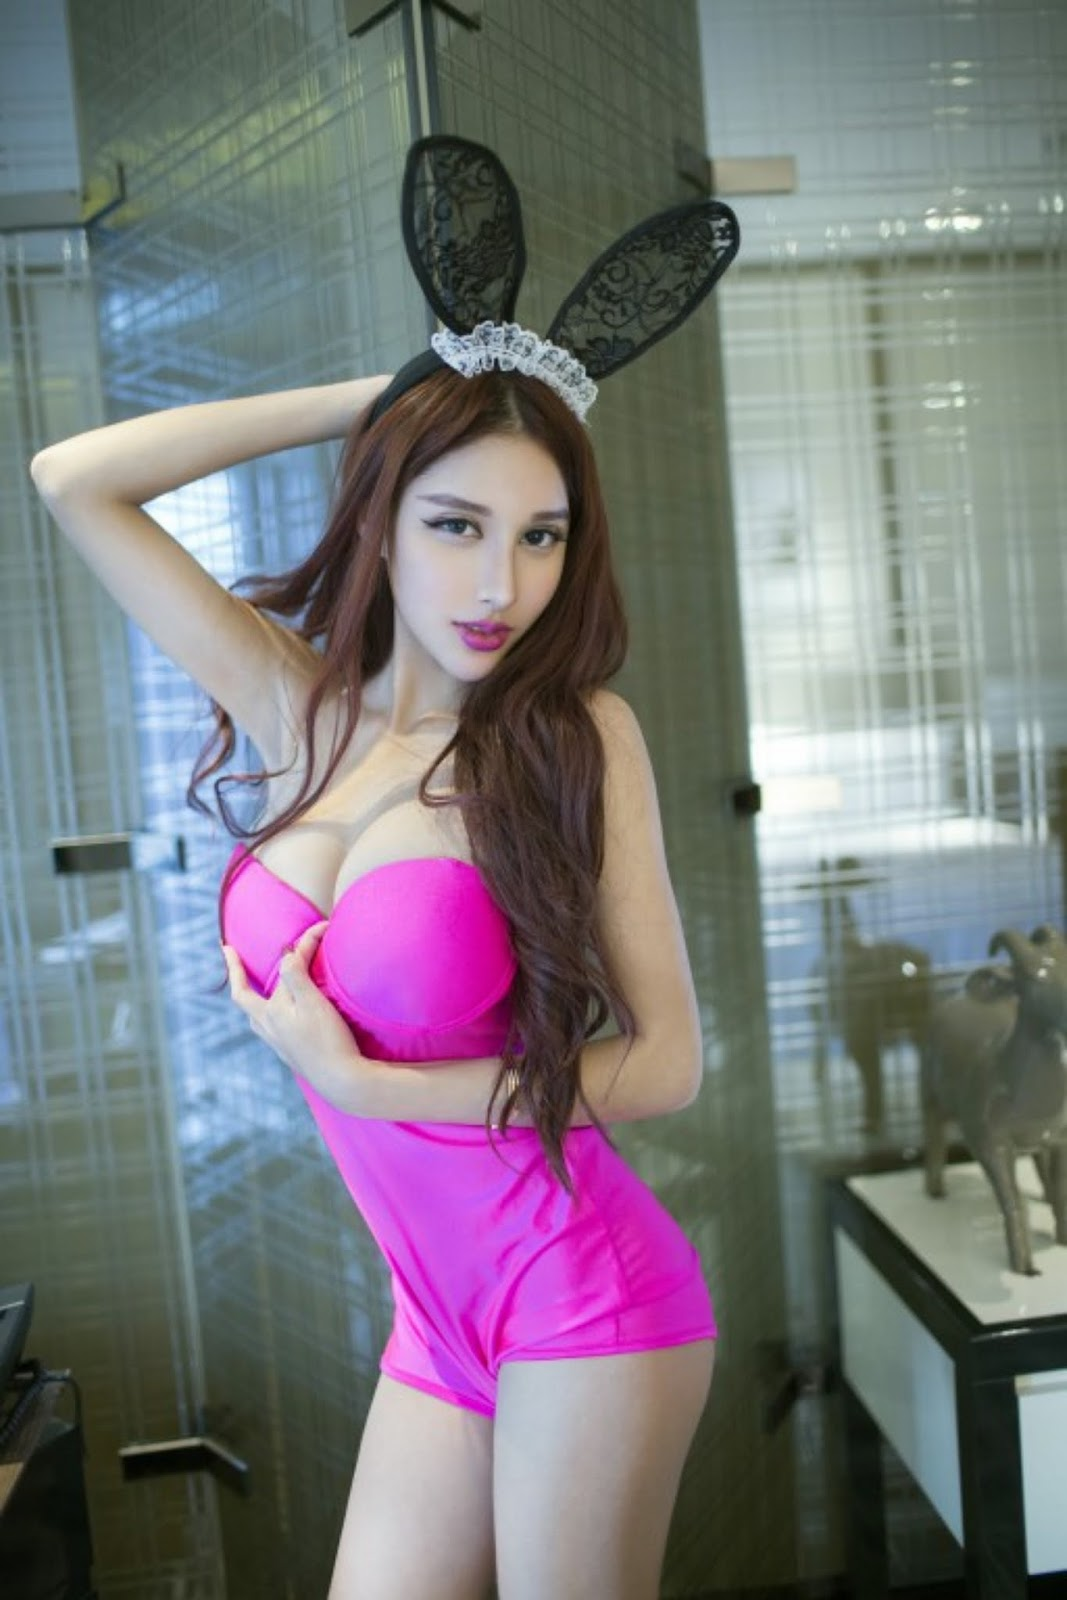 %25C2%25B1 %25C2%25B1 13 - Model Nude TUIGIRL NO.49 Beauty Body Tits